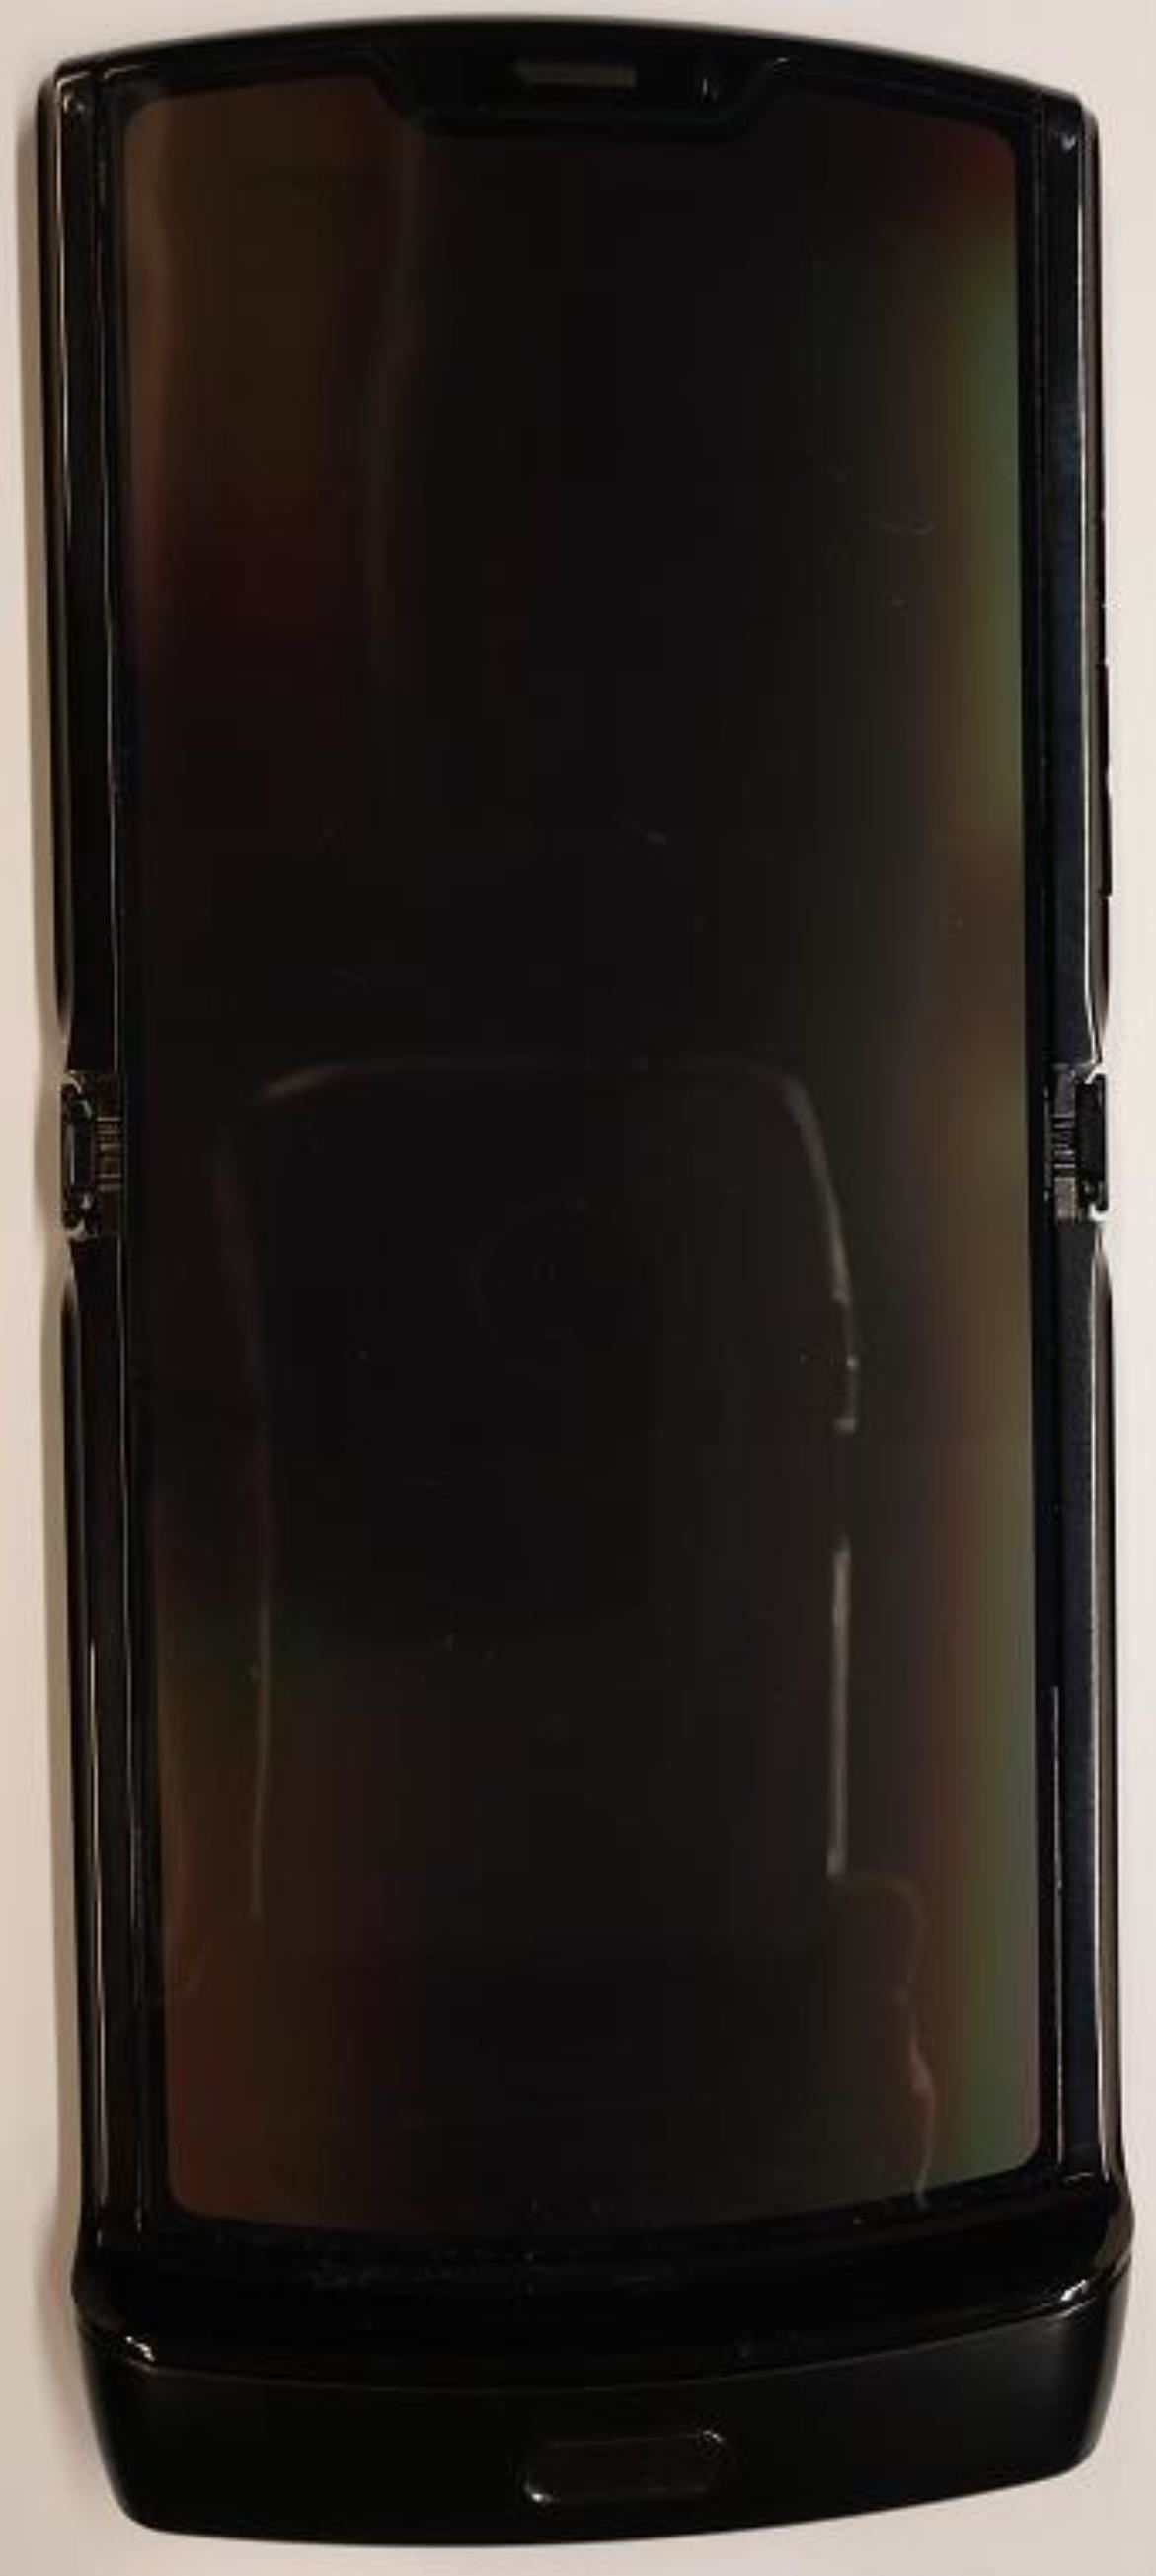 New Motorola RAZR Surface 2019 photos in FCC filing, dimensioning, notch and biometrics